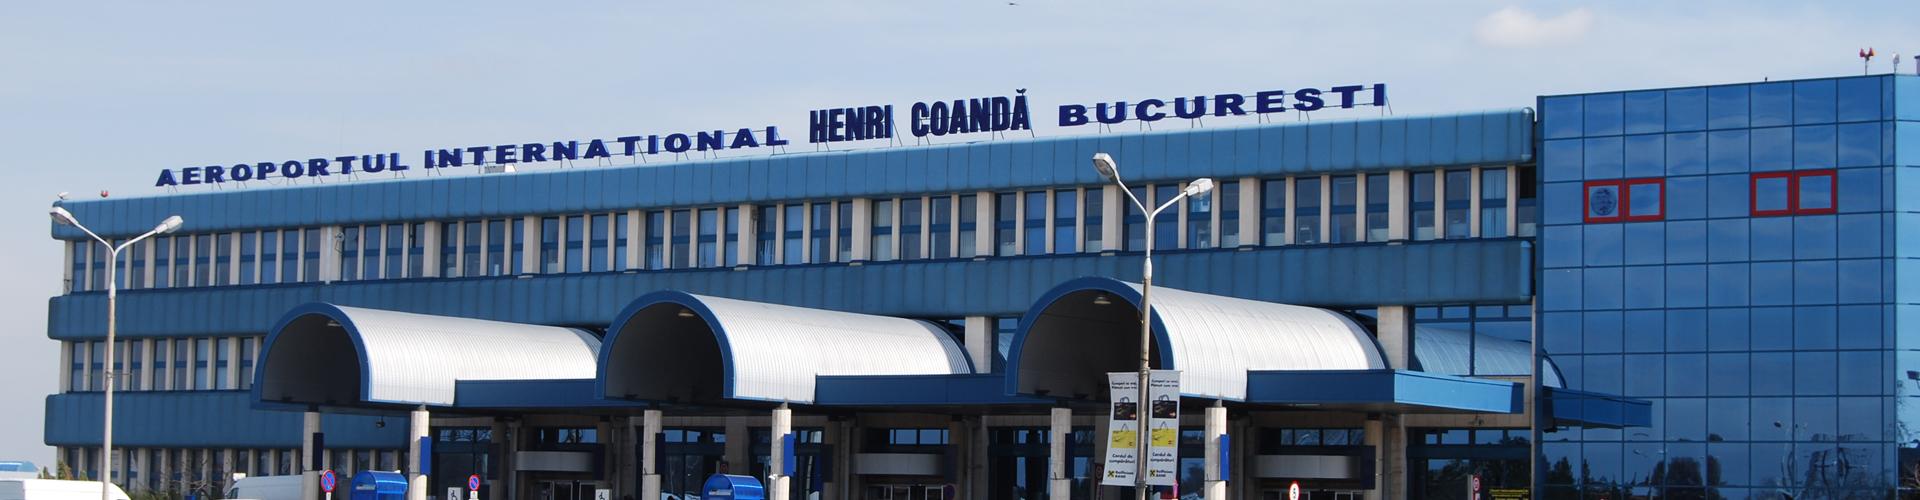 TransferTaxi-EUROPE | Bucharest-Airport(Otopeni)-3 - TransferTaxi-EUROPE